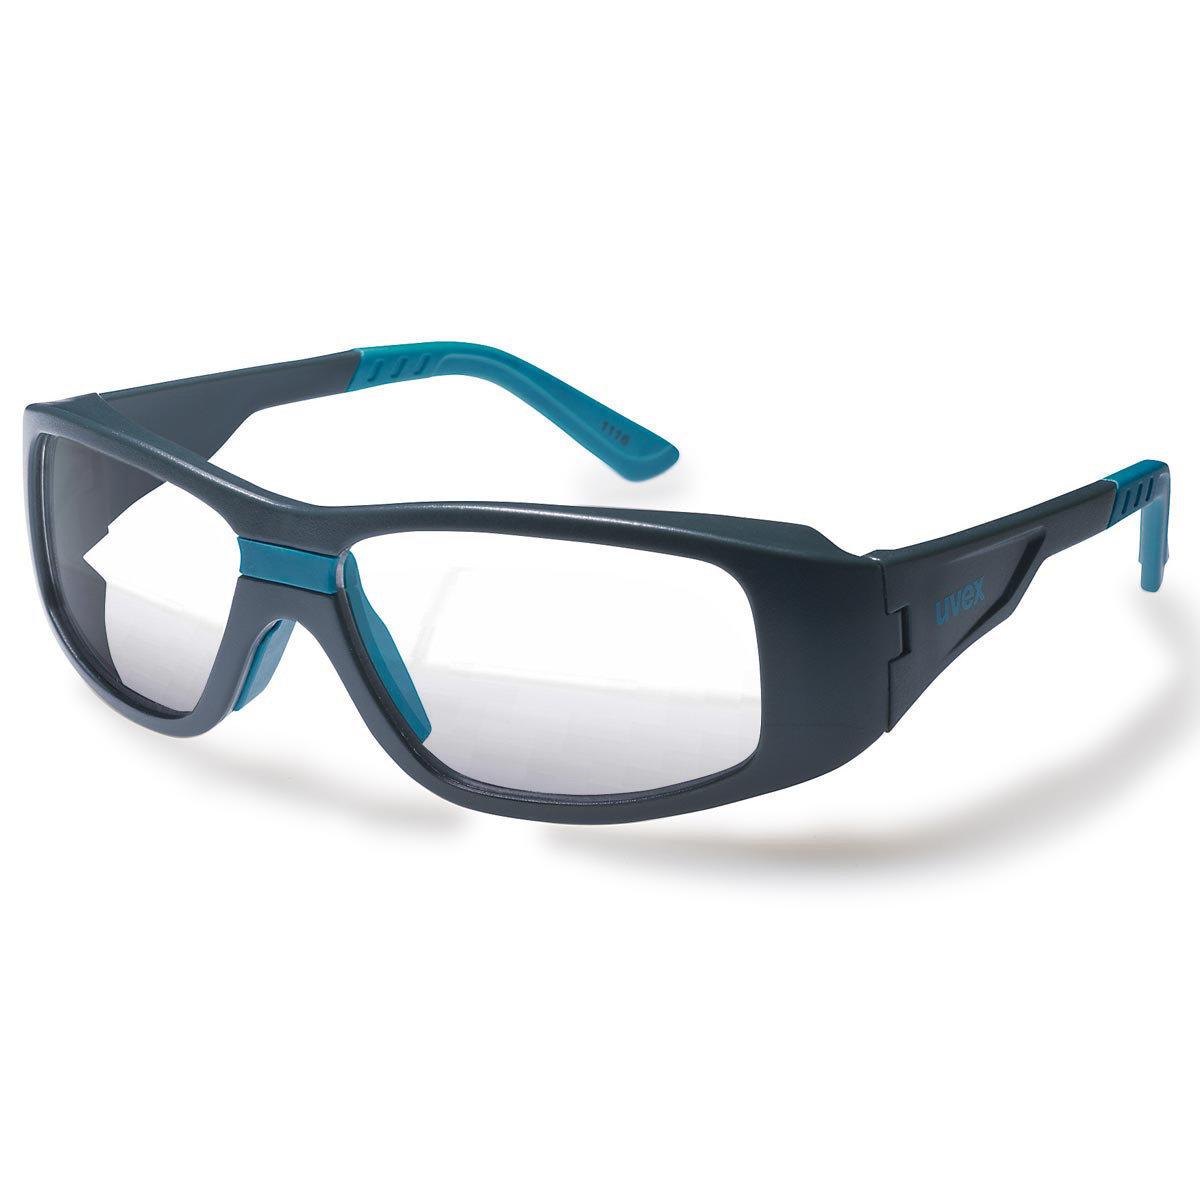 Carhartt bril diverse kleuren - Super-Entspiegelung